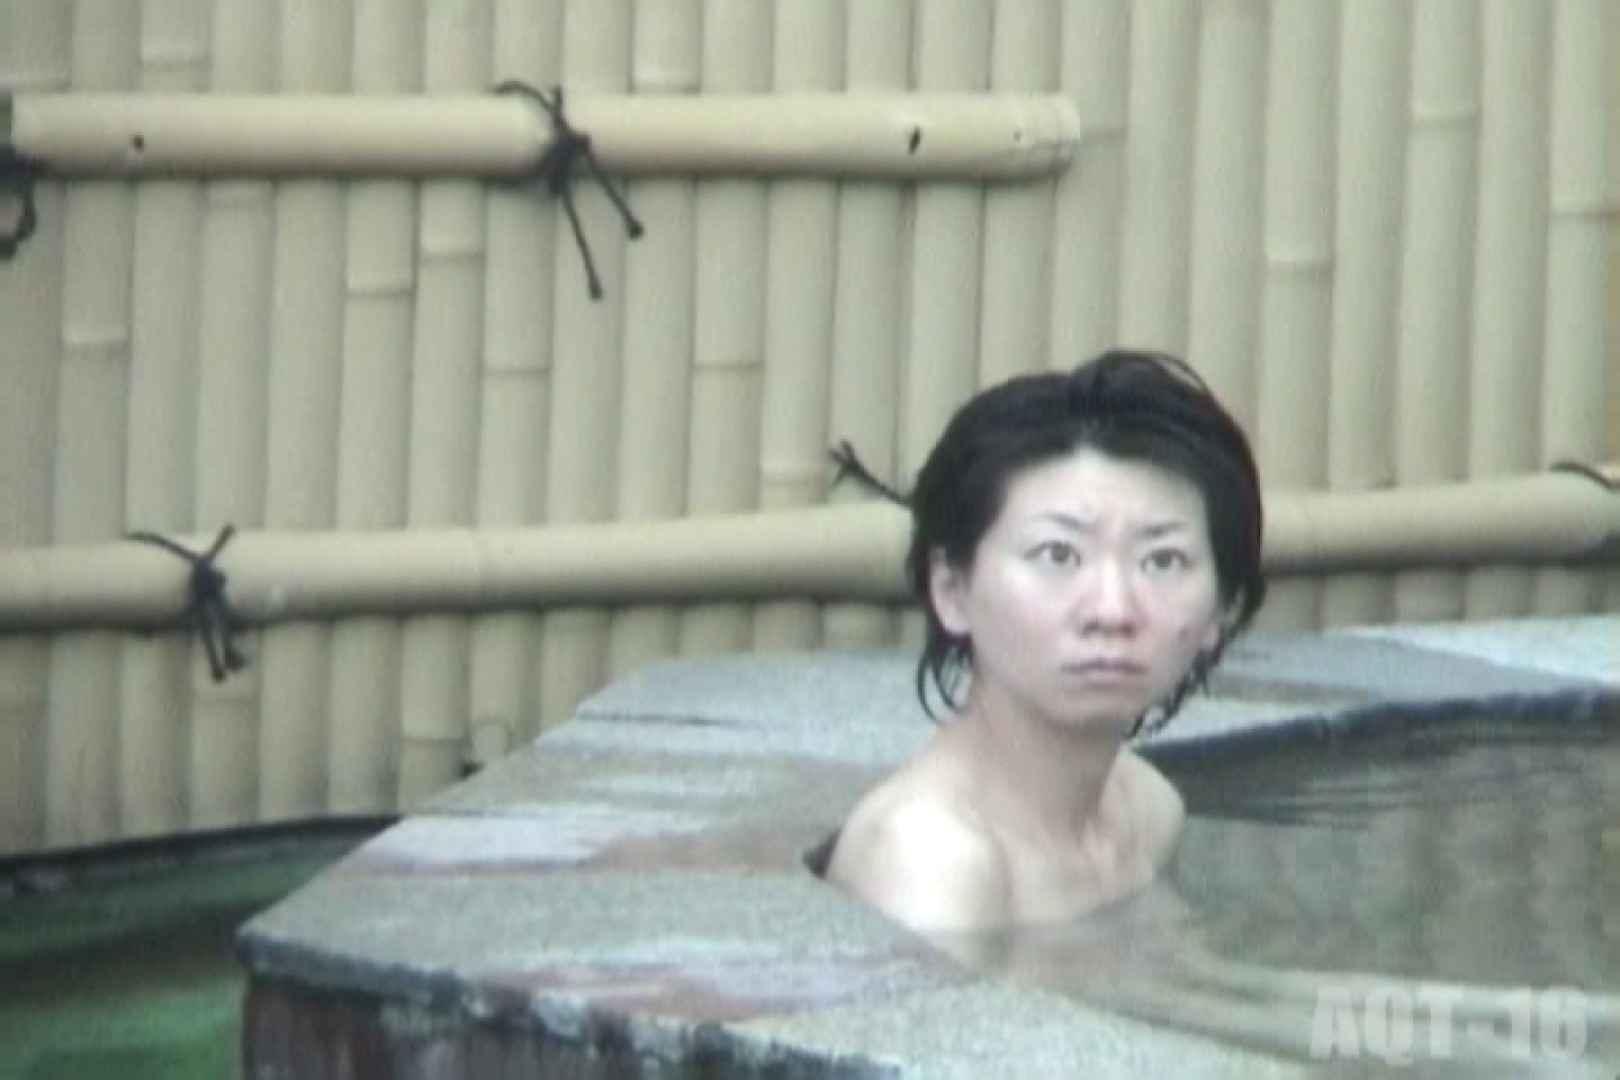 Aquaな露天風呂Vol.842 盗撮師作品  96pic 36